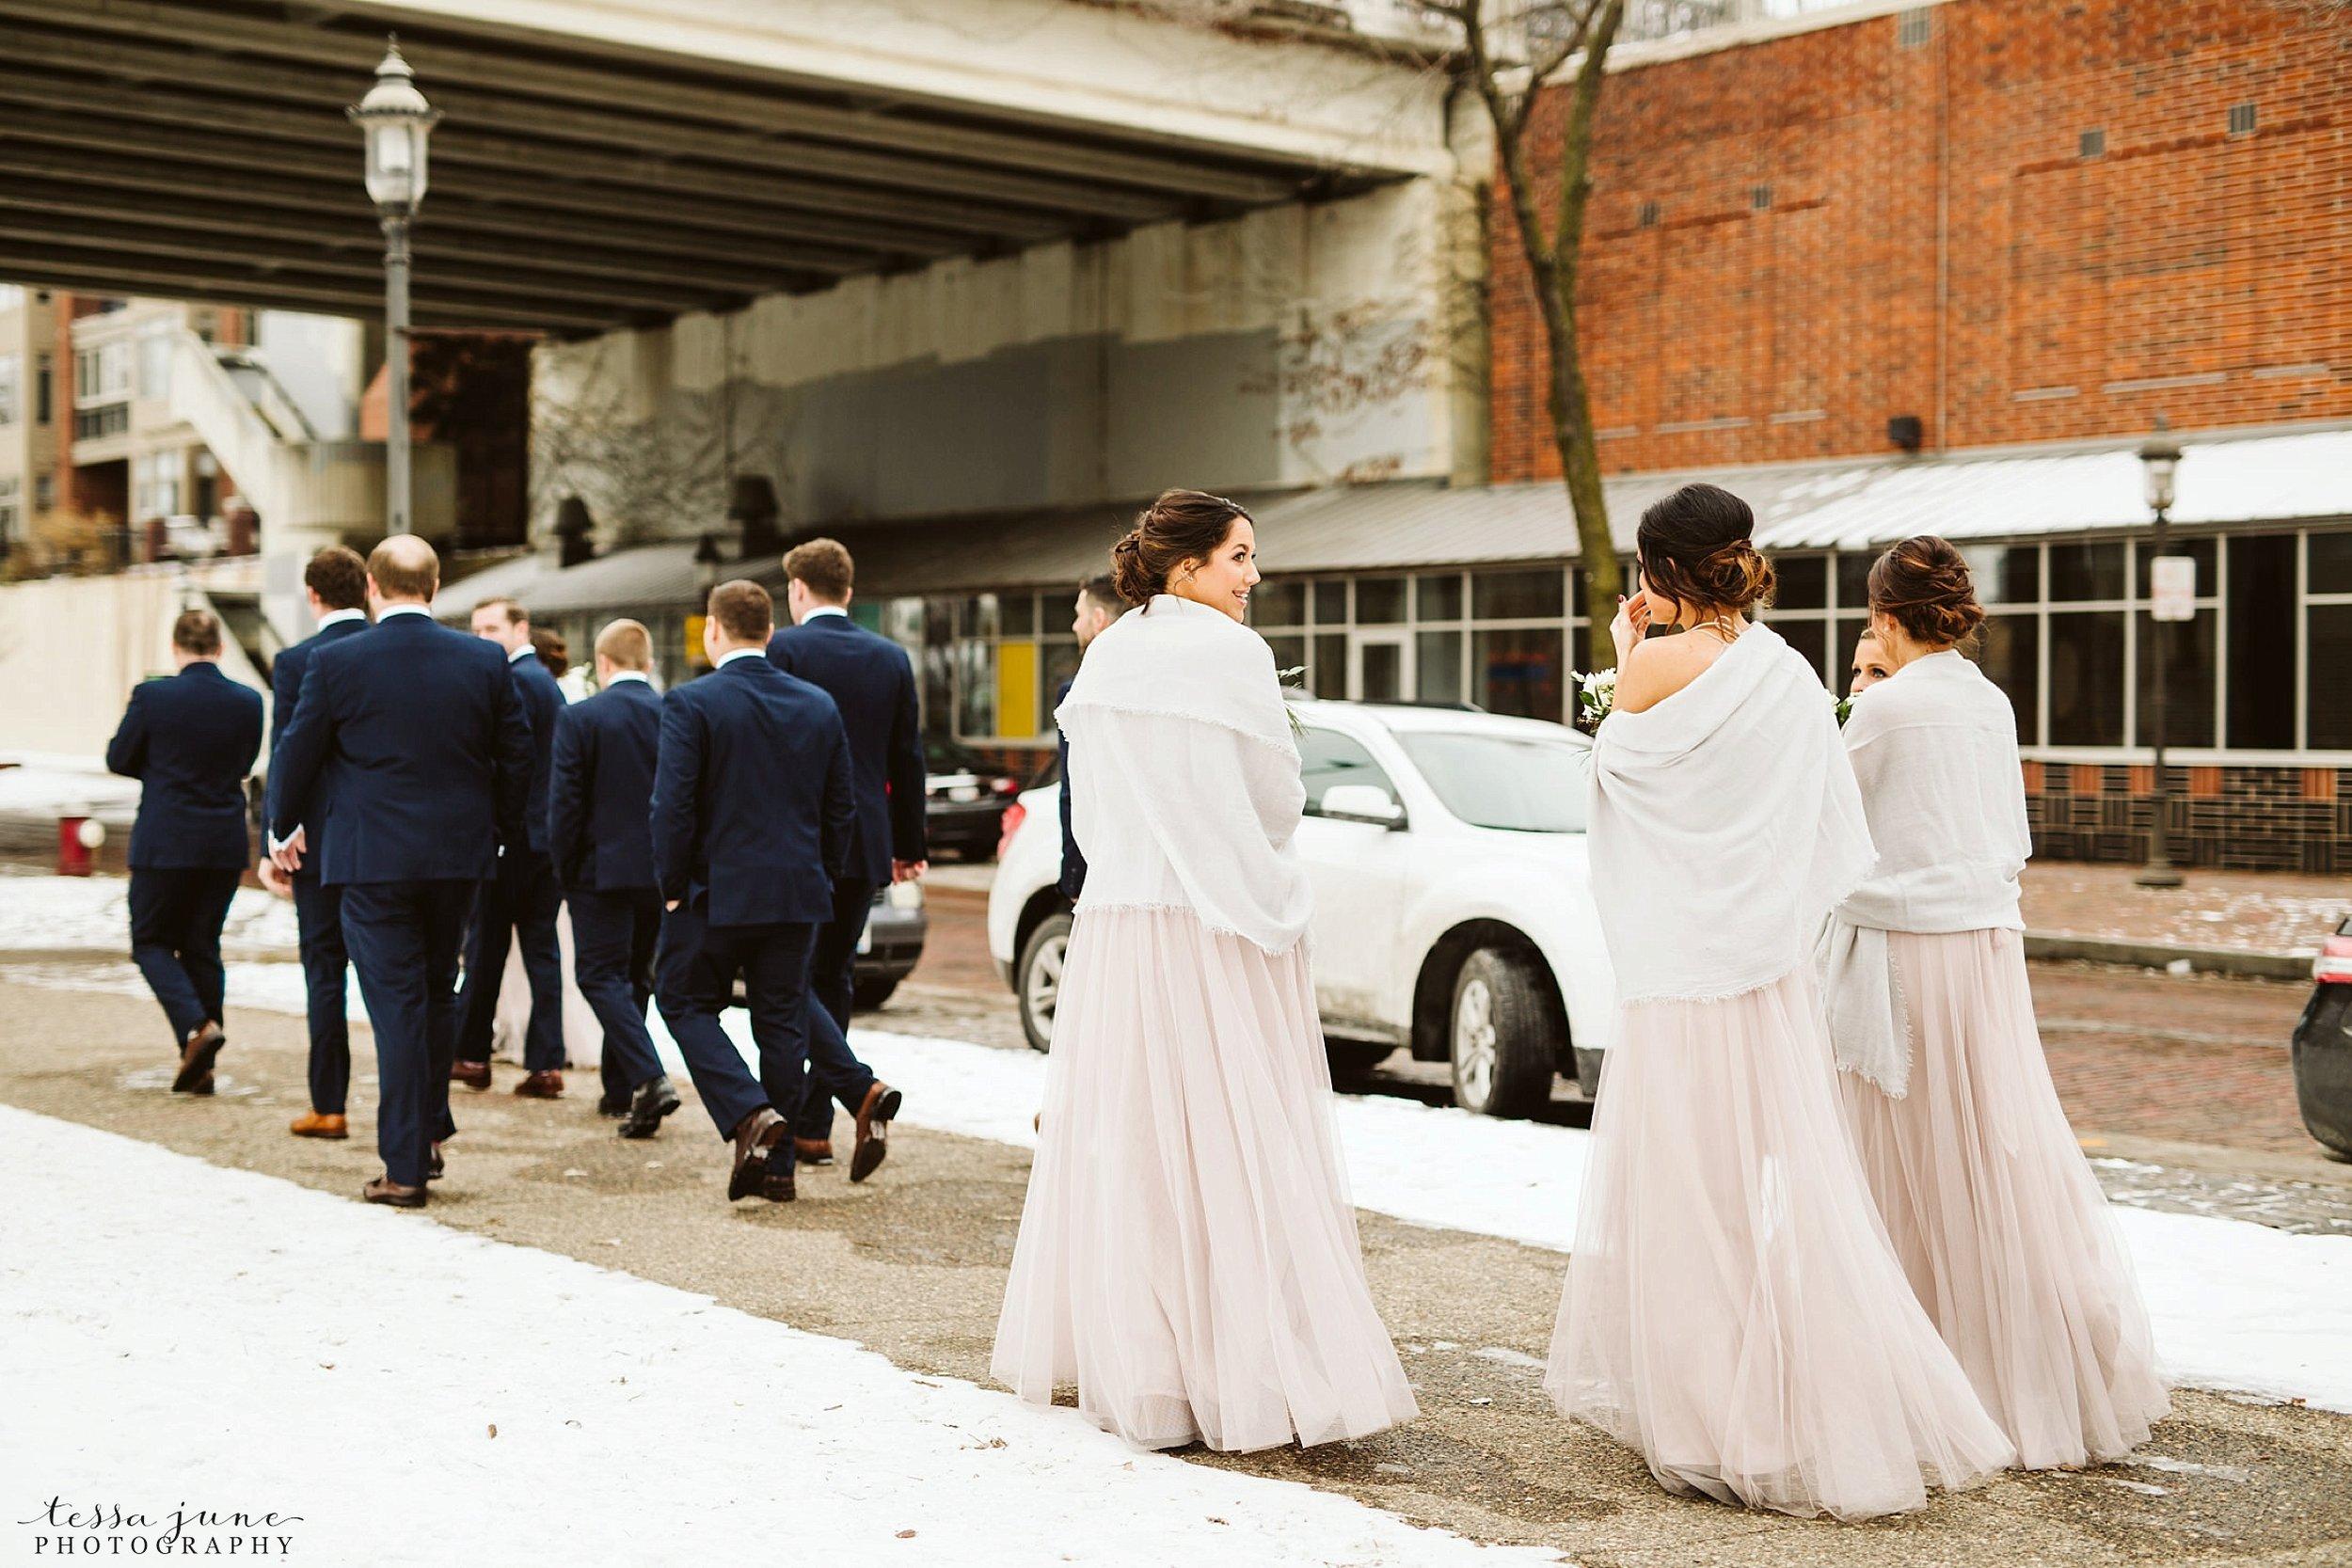 minneapolis-event-center-winter-romantic-snow-wedding-december-105.jpg